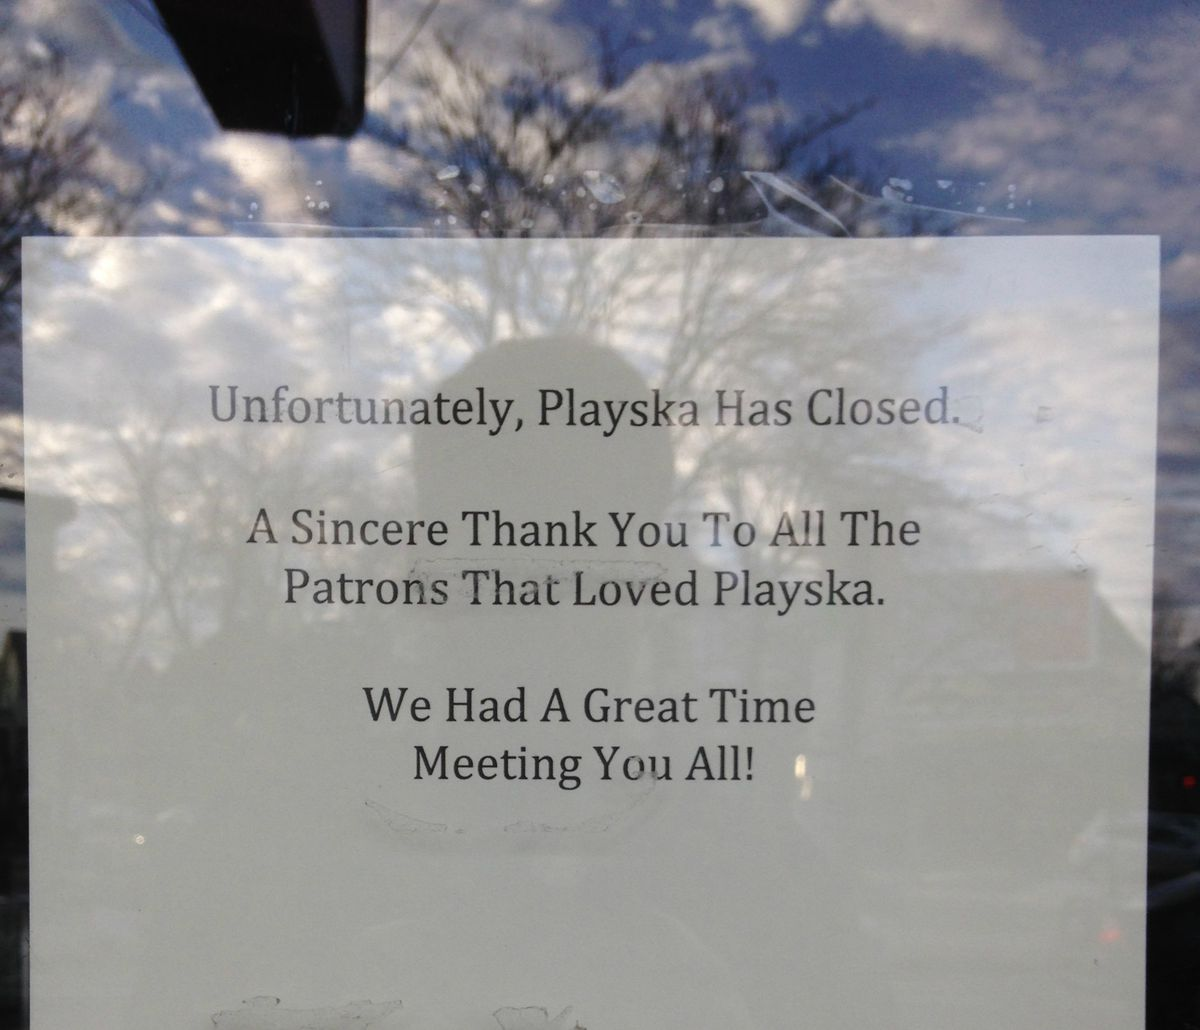 Playska closed